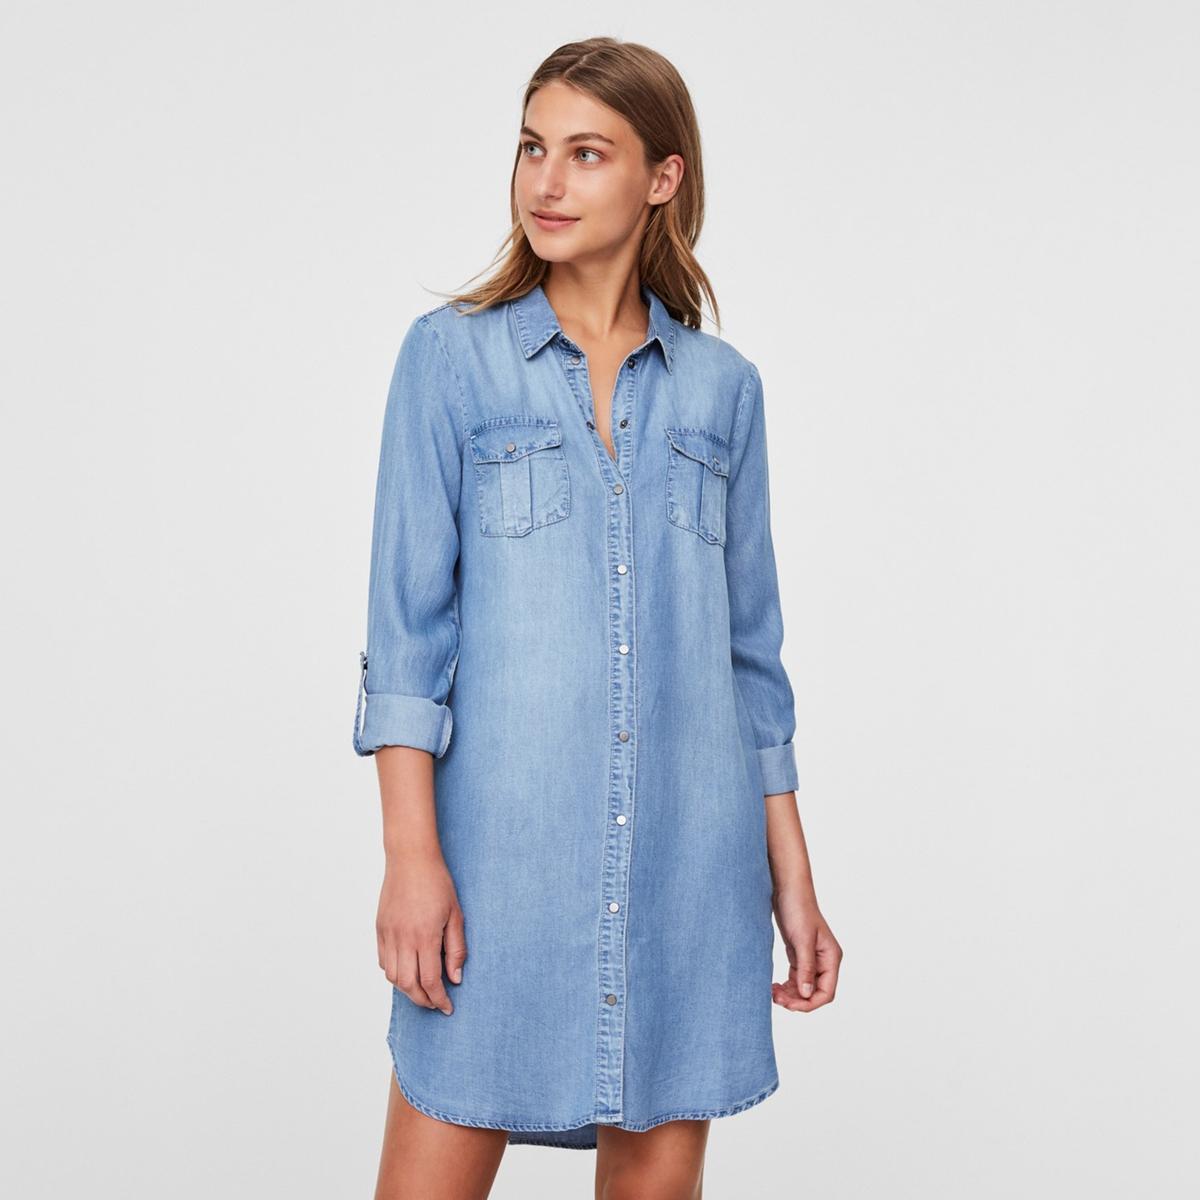 Платье-рубашка La Redoute Джинсовая S синий